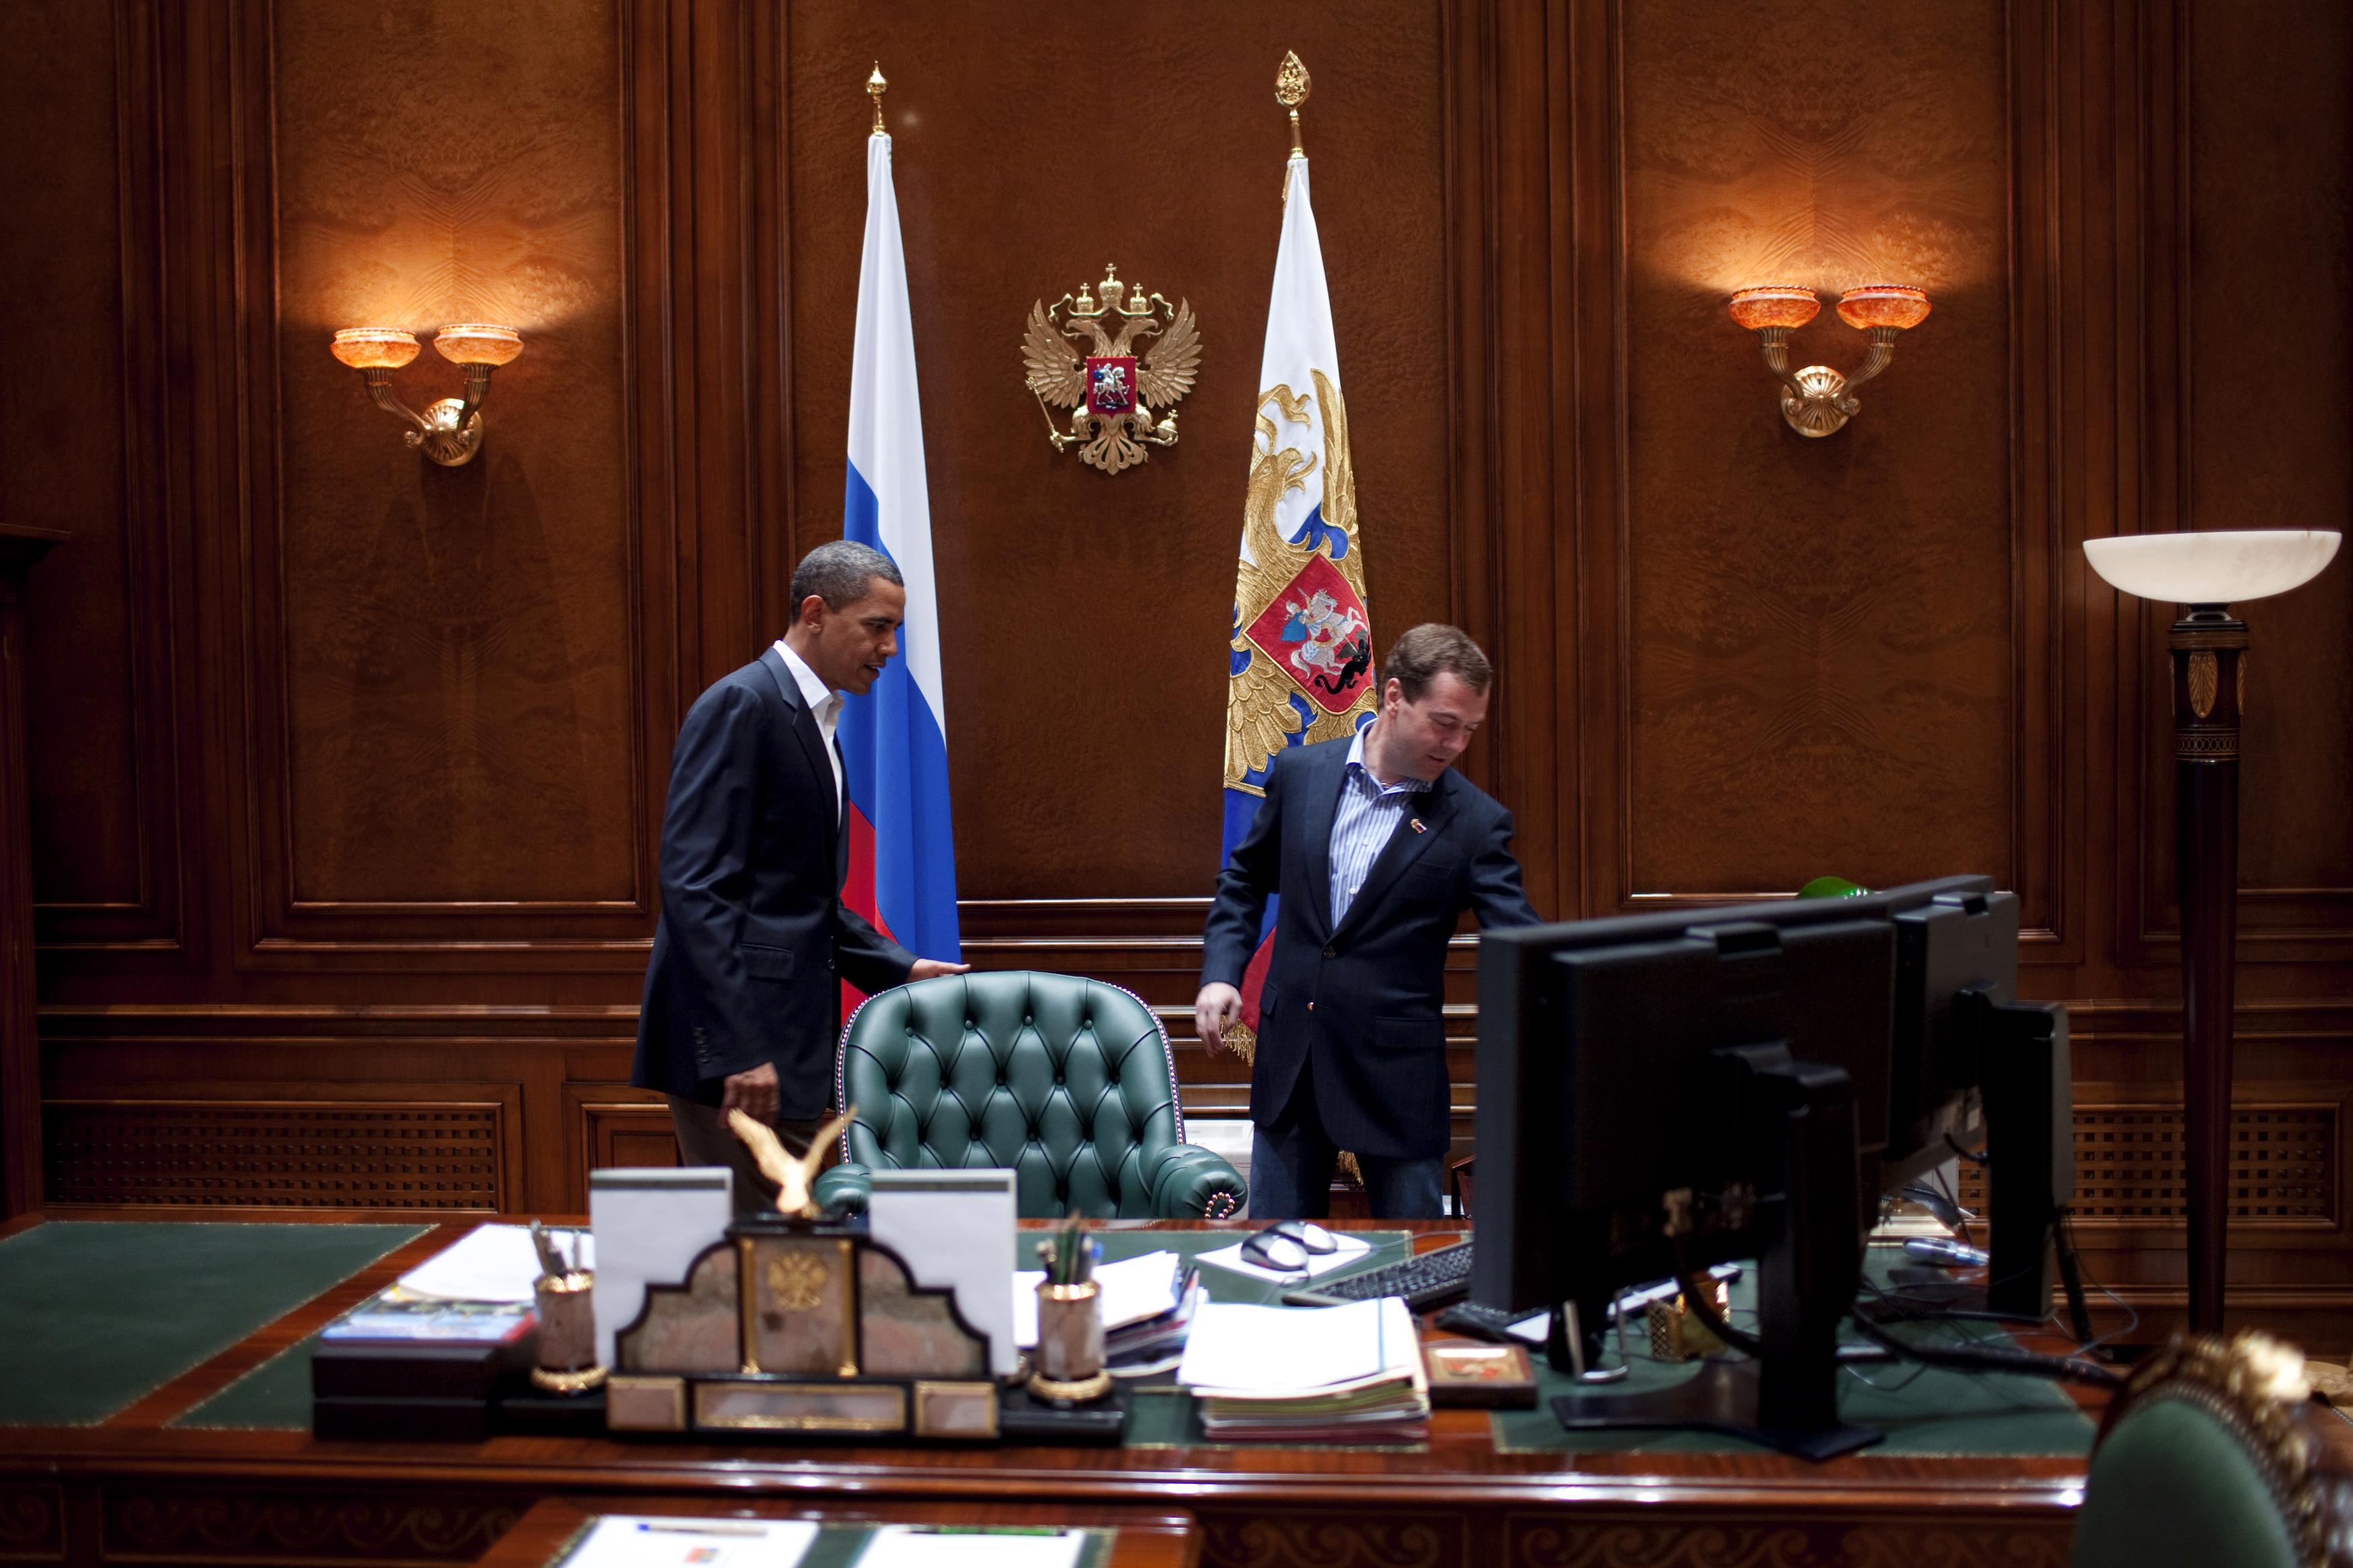 Trump Oval Office Pictures File Barack Obama In Dmitry Medvedev S Office Jpg